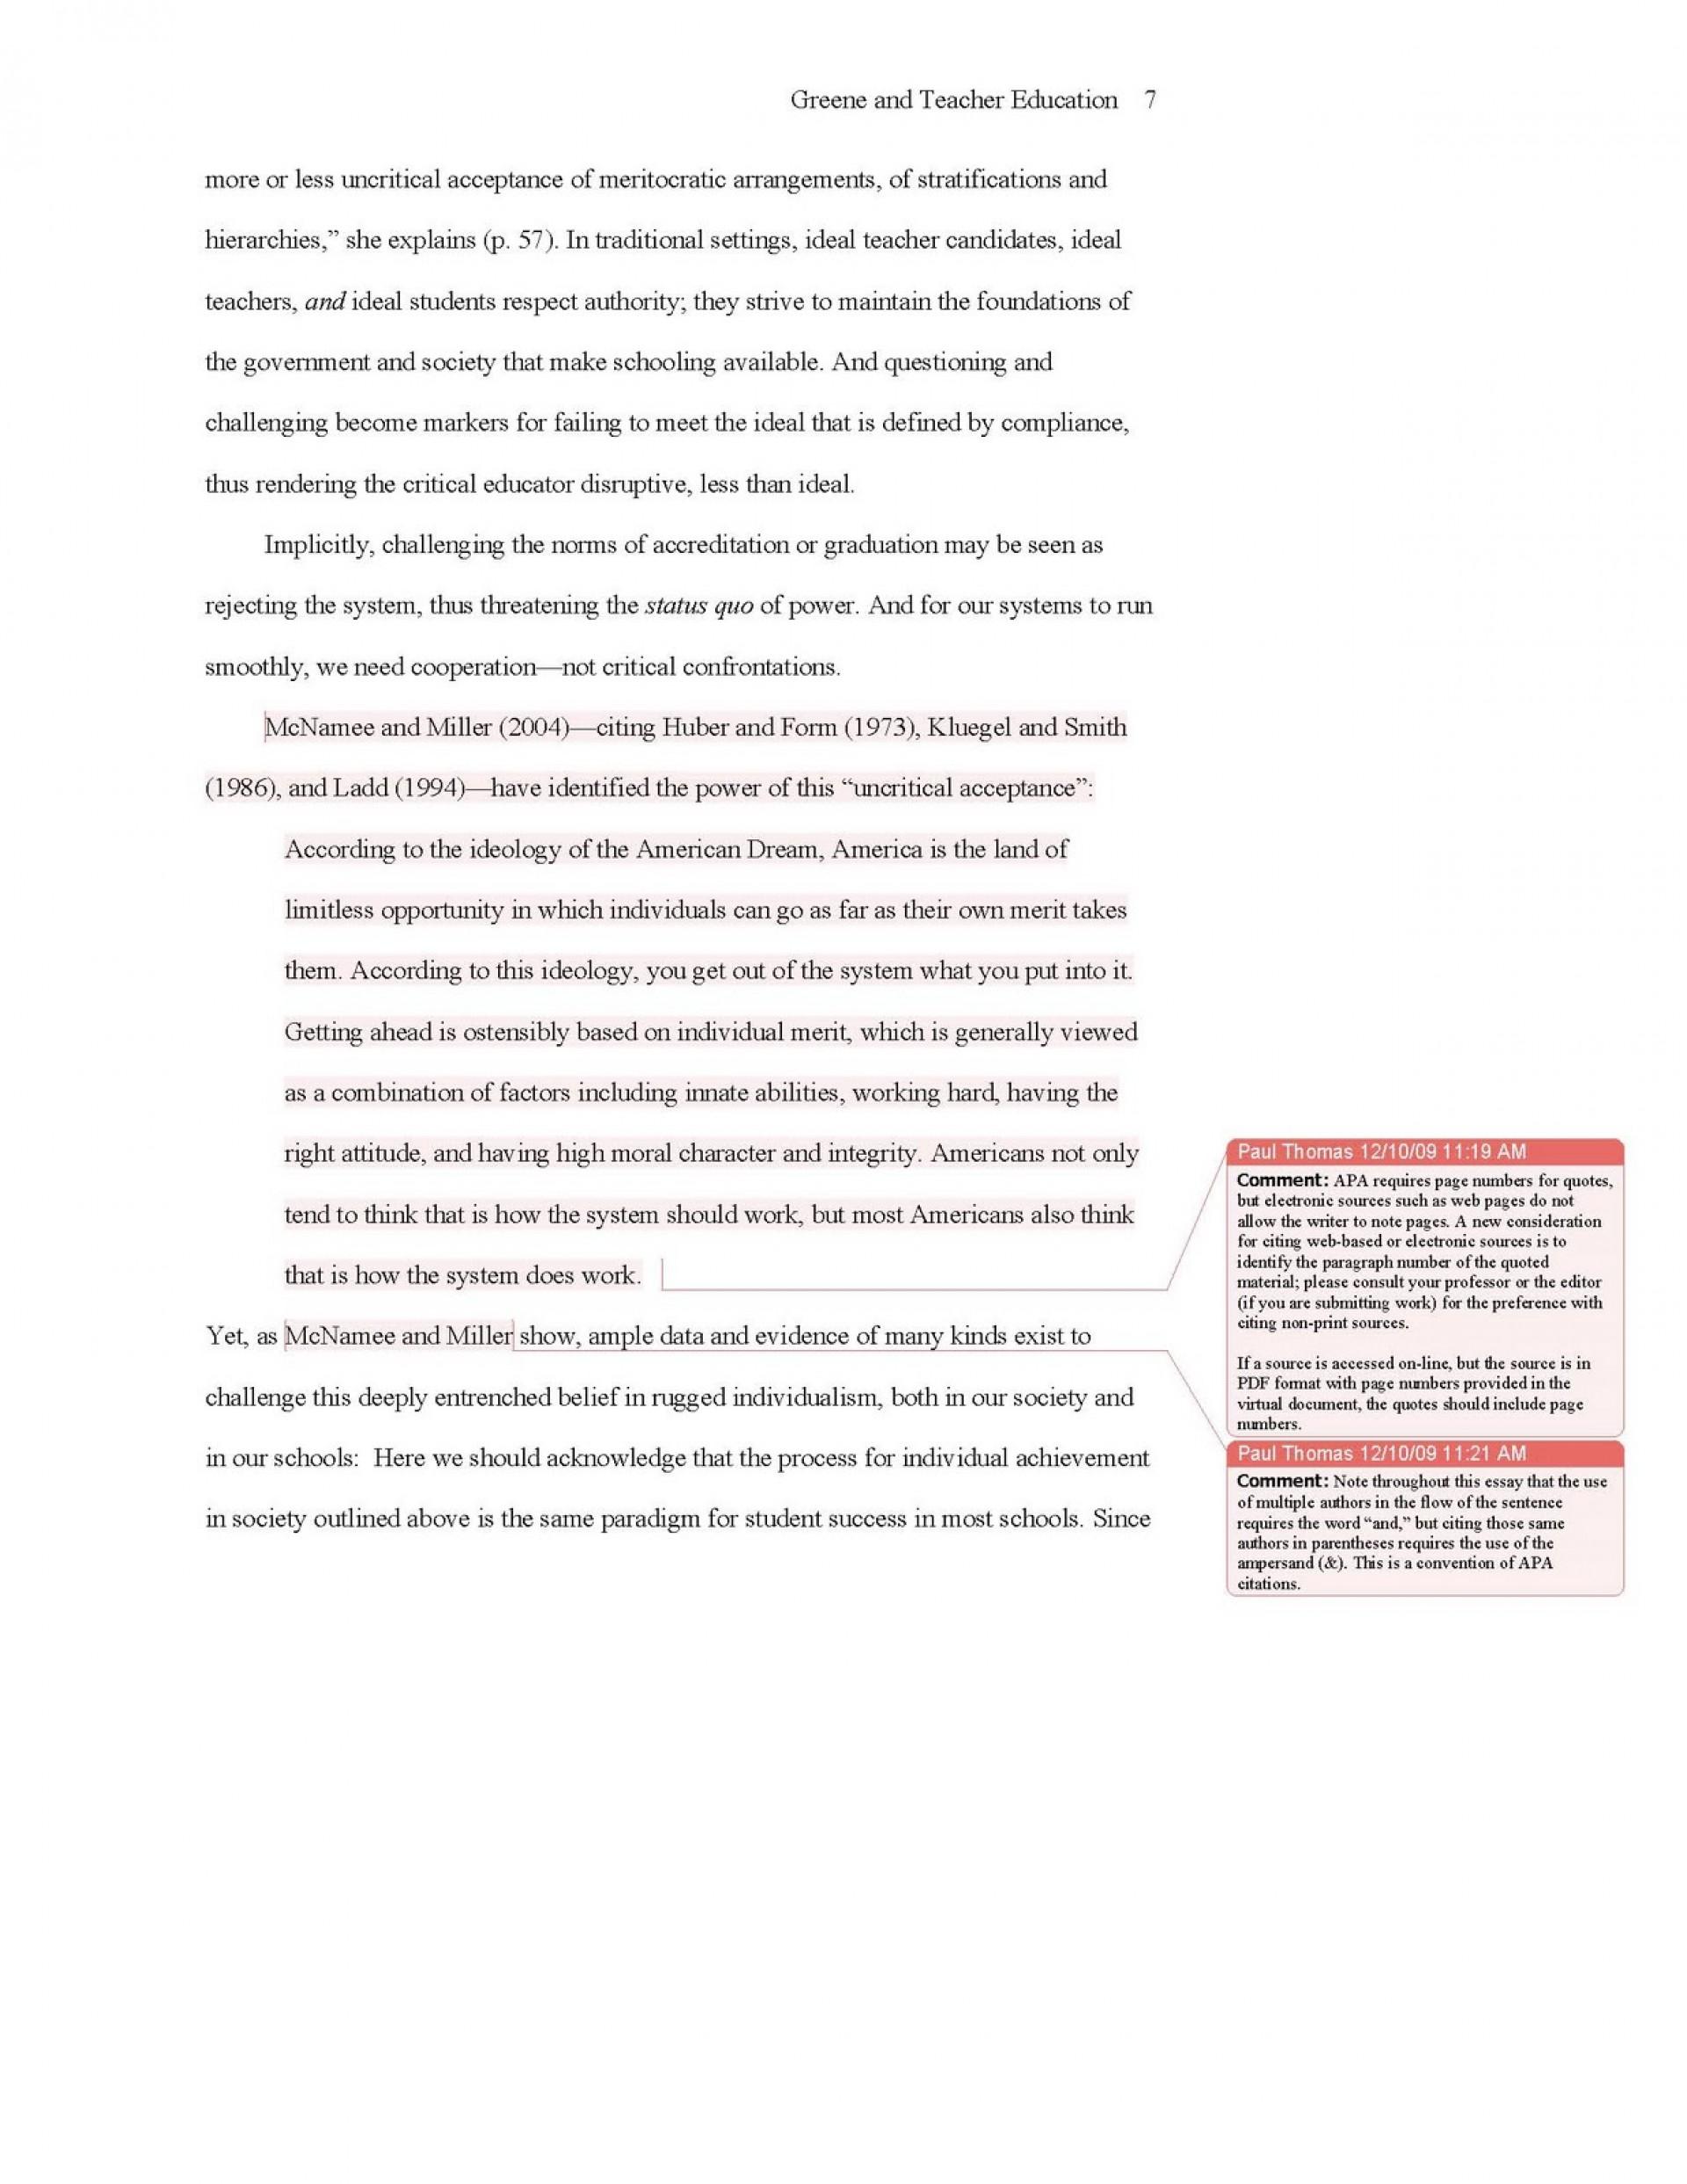 014 Descriptive Essay Thesis Apa Sample 2010update7 Rare Statement Generator Pdf 1920